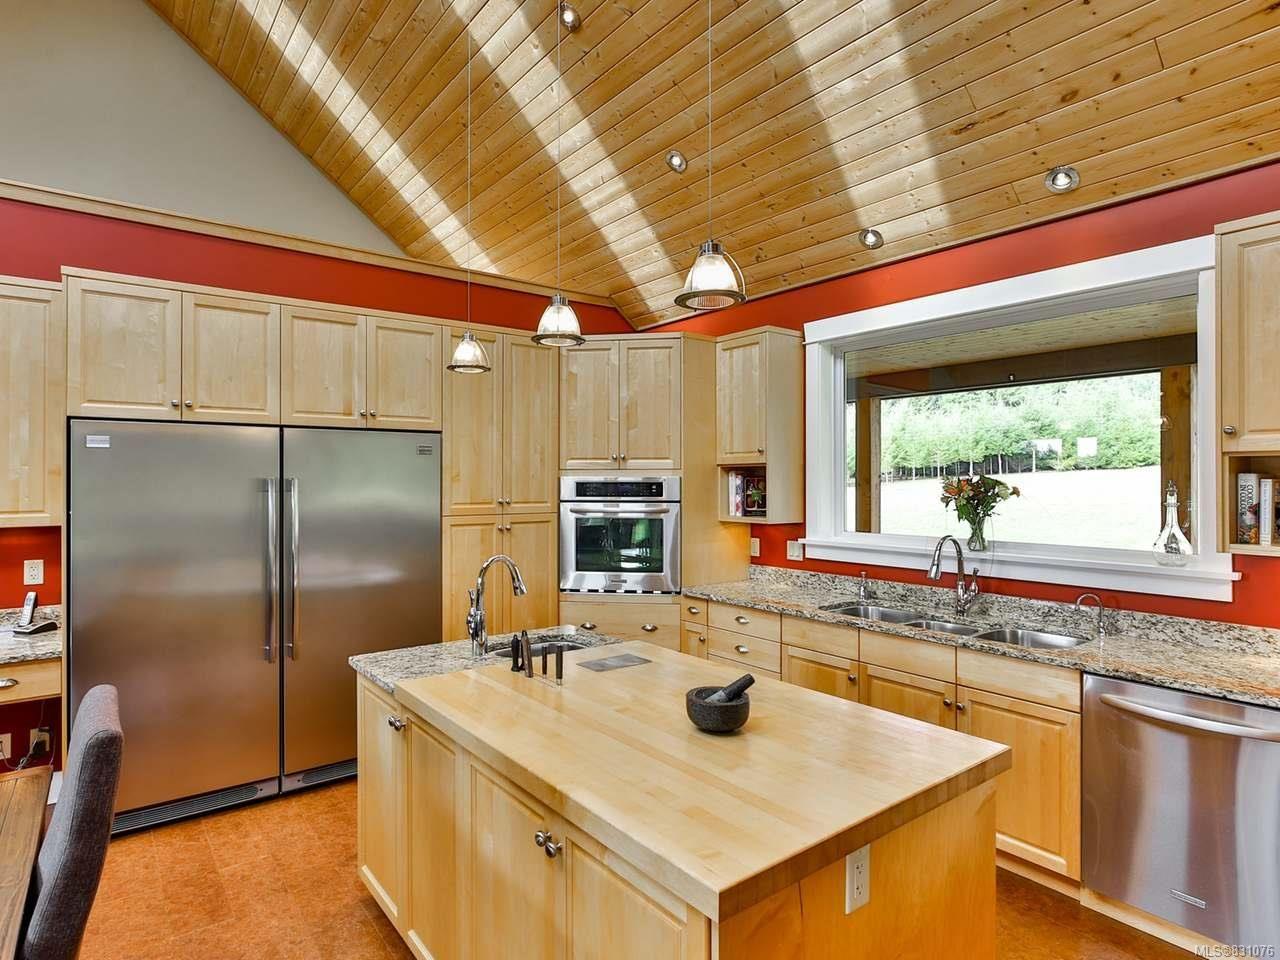 Photo 13: Photos: 6159 Strathcona St in PORT ALBERNI: PA Alberni Valley House for sale (Port Alberni)  : MLS®# 831076